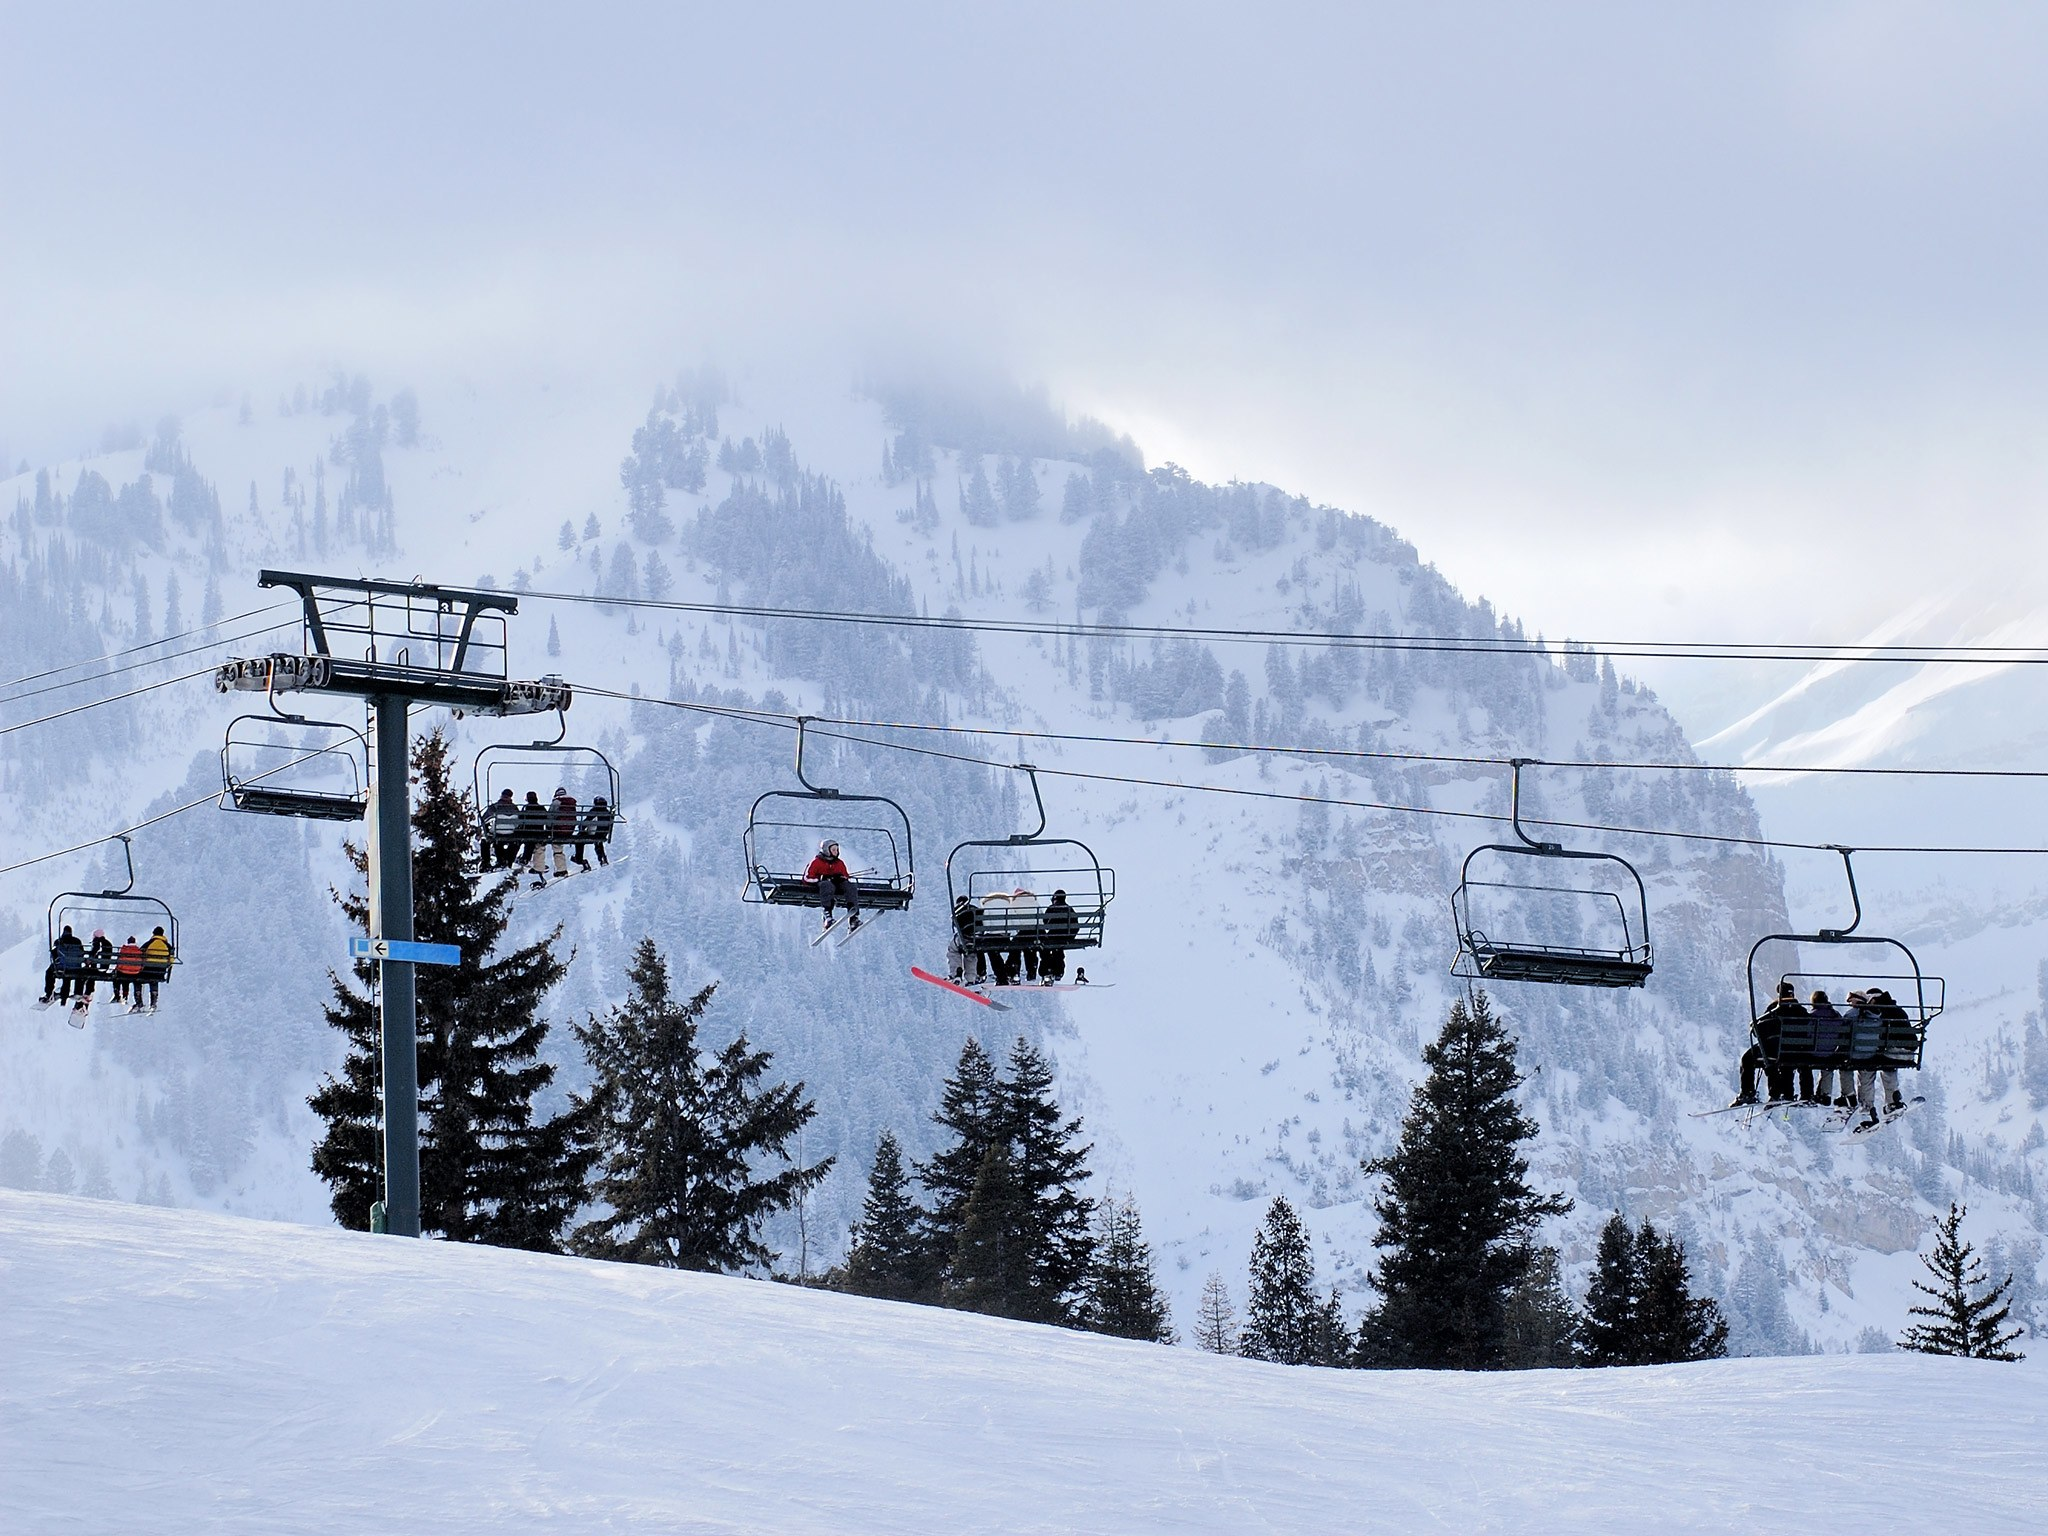 Top 5 Ski Resorts This Ski Season